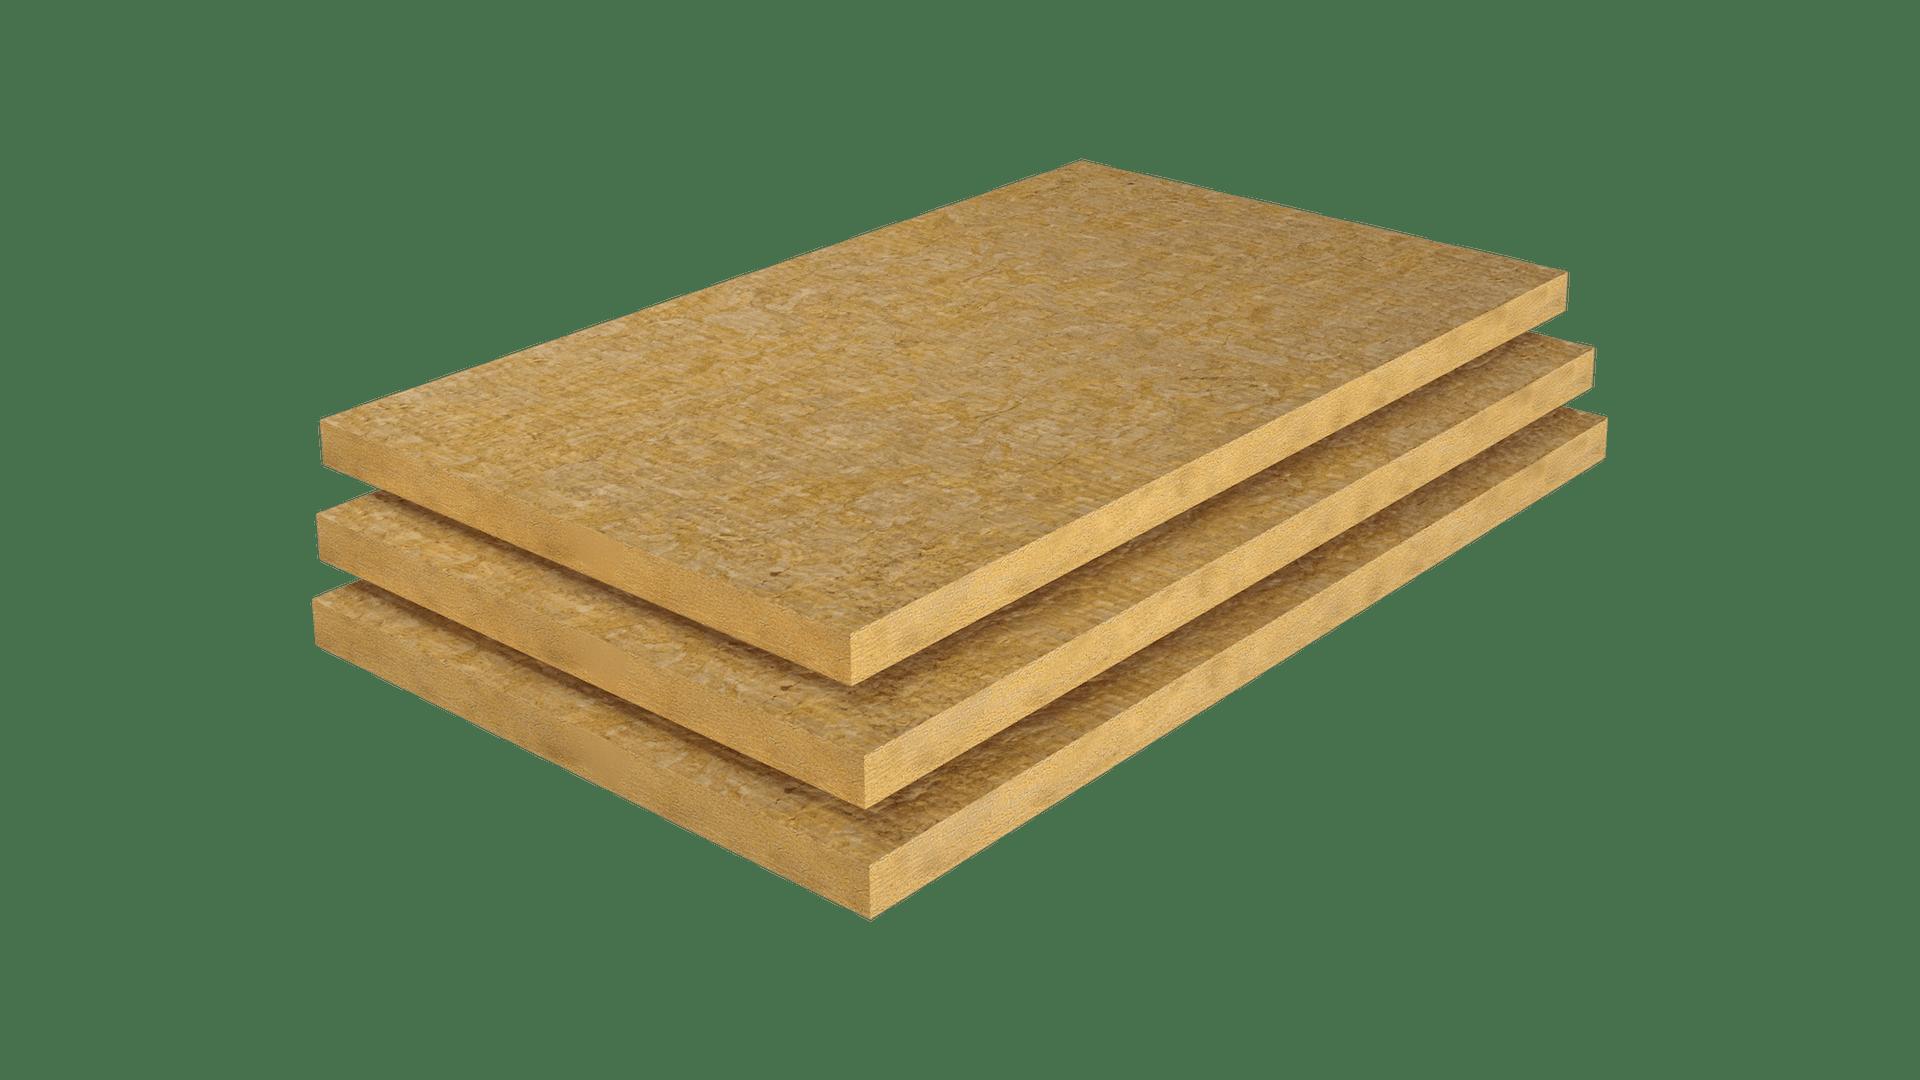 RUF BATTS, RUF BATTS V OPTIMA, roof, roof insulation